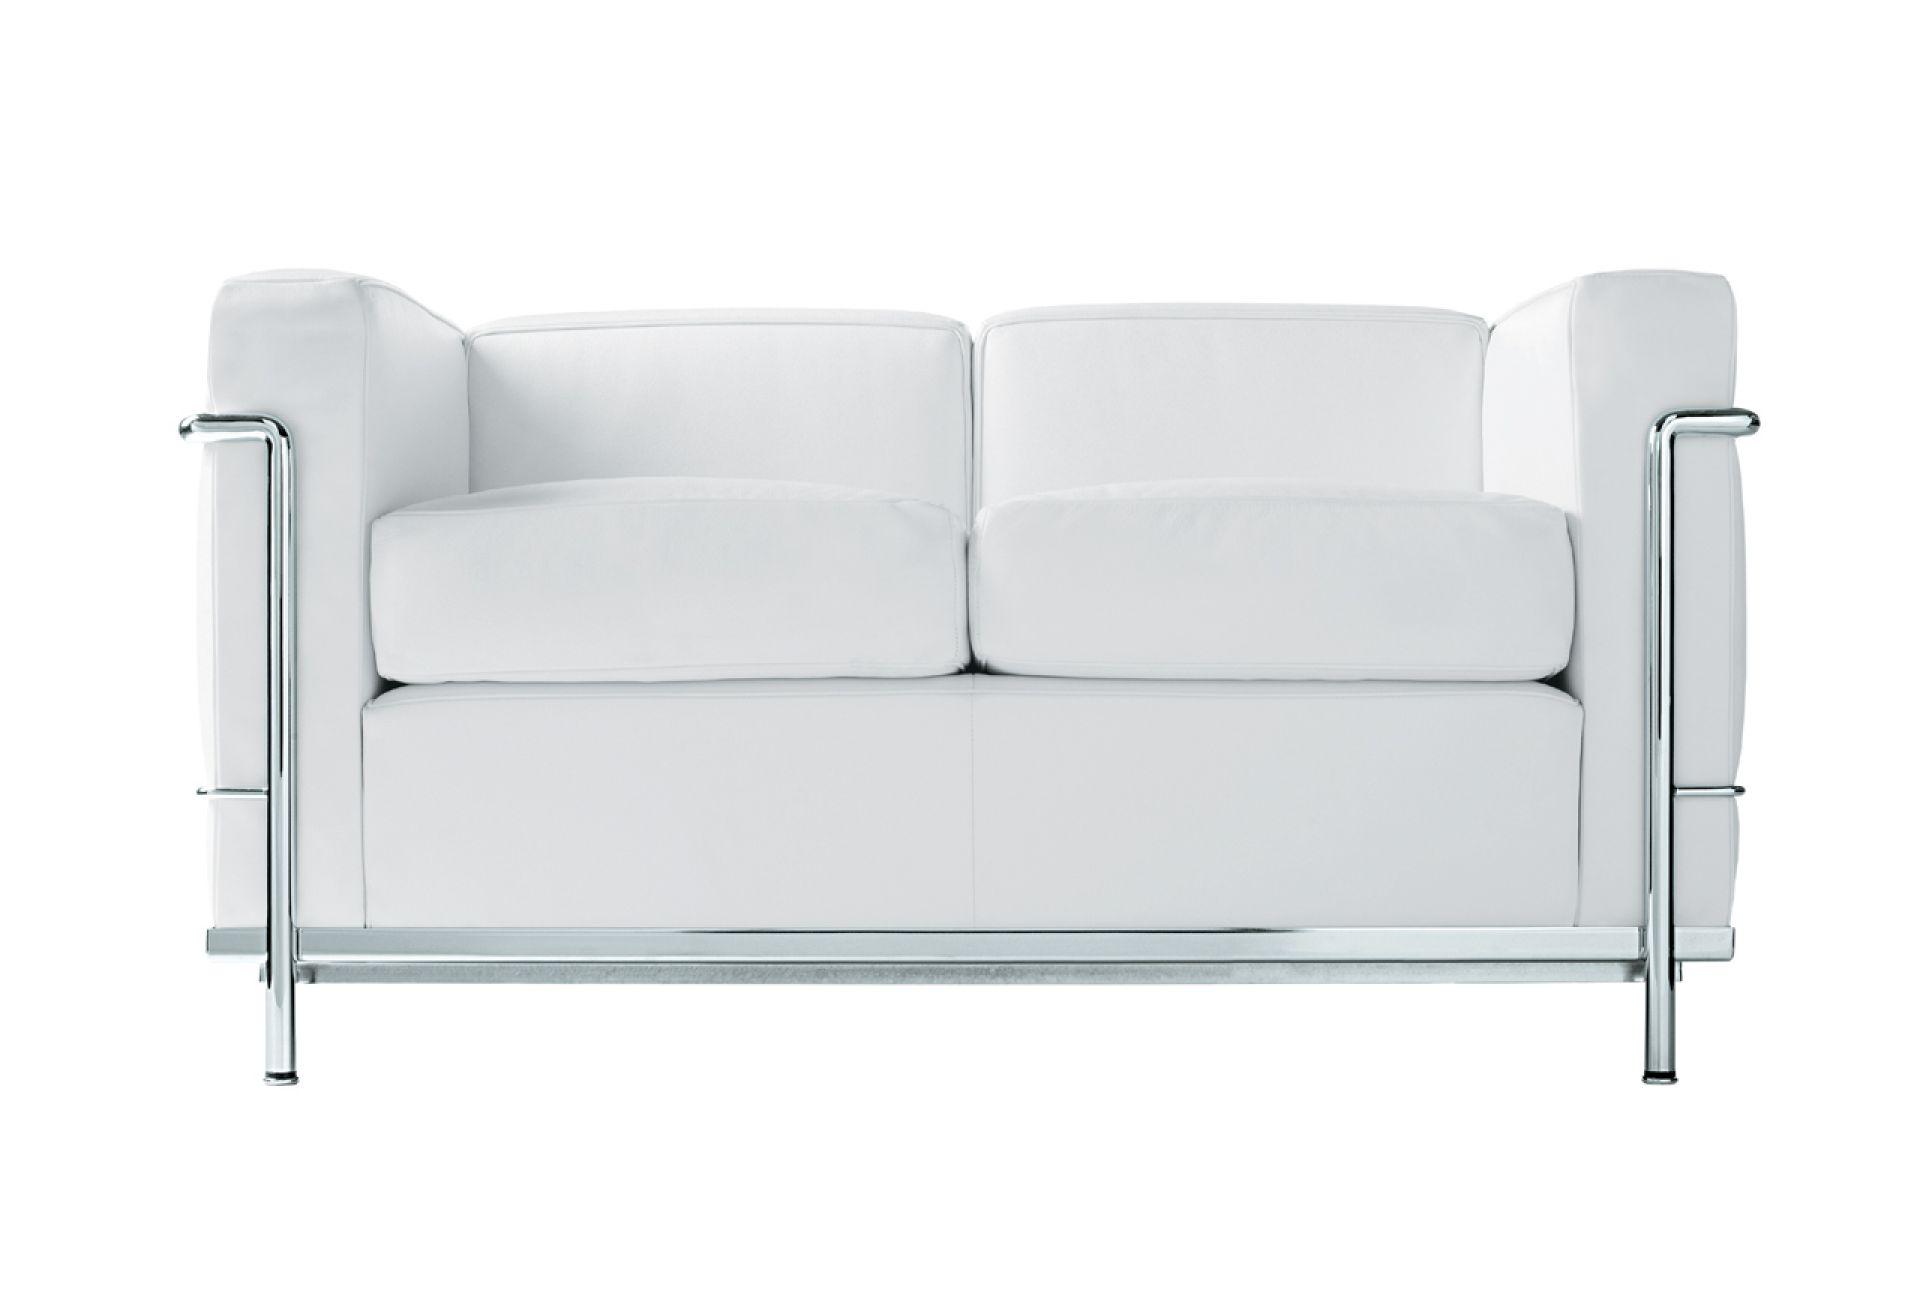 LC2 Sofa Zweisitzer Gestell Chrom Cassina